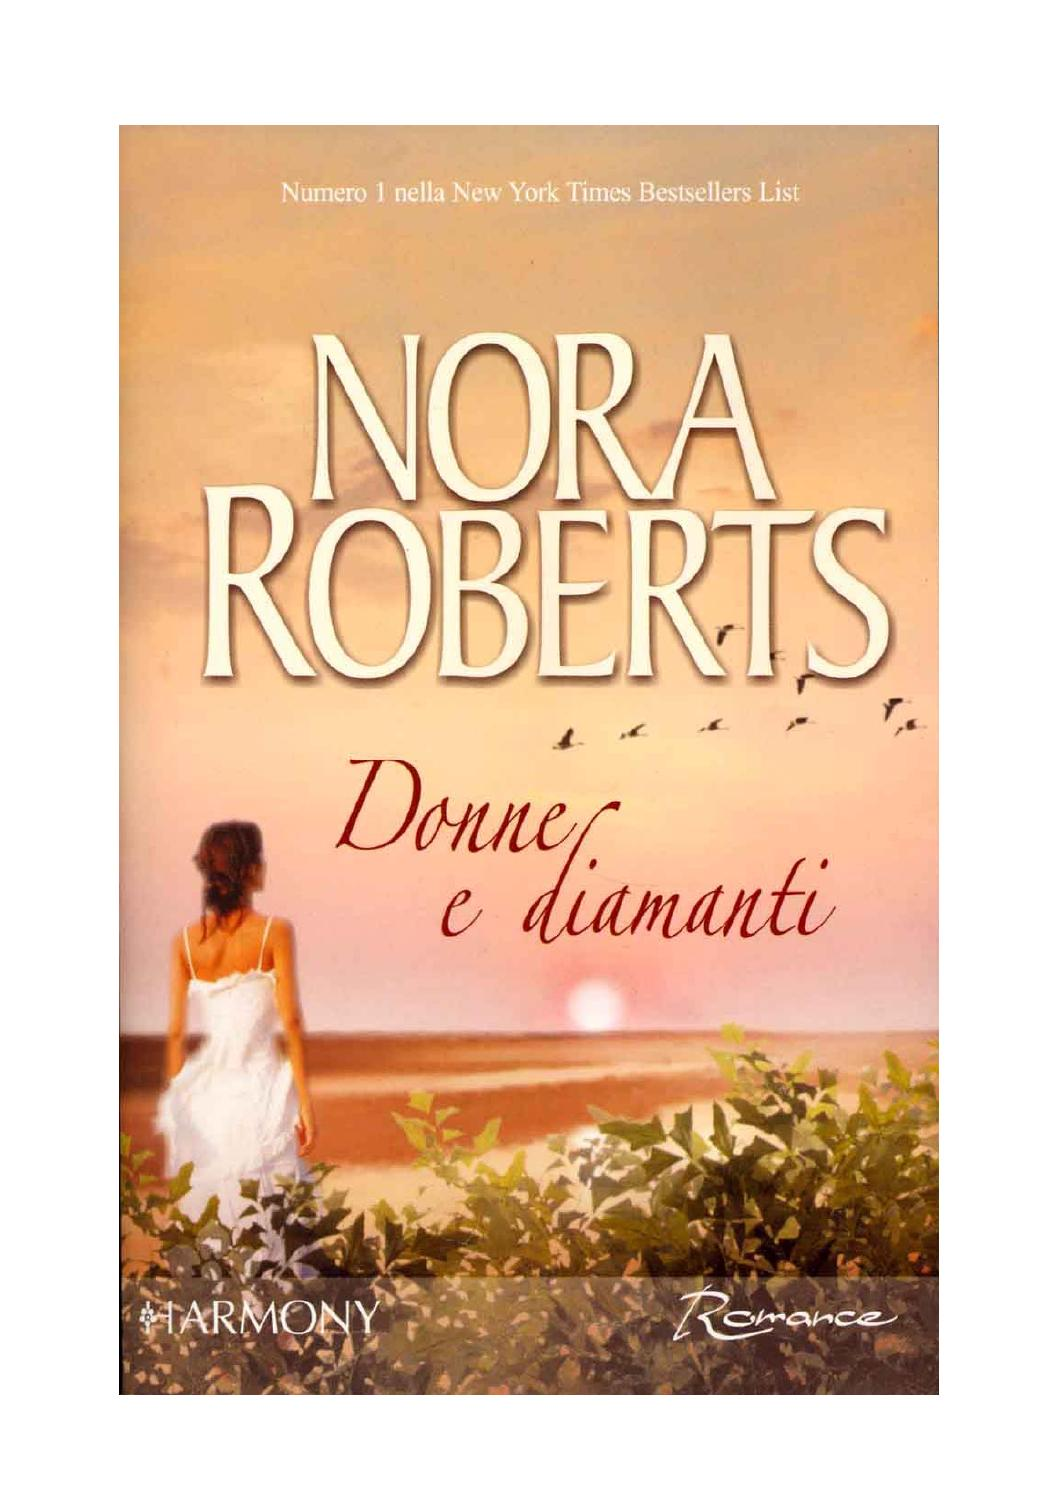 Donne e diamanti nora roberts by Cinzia Breads - issuu 3262320b401